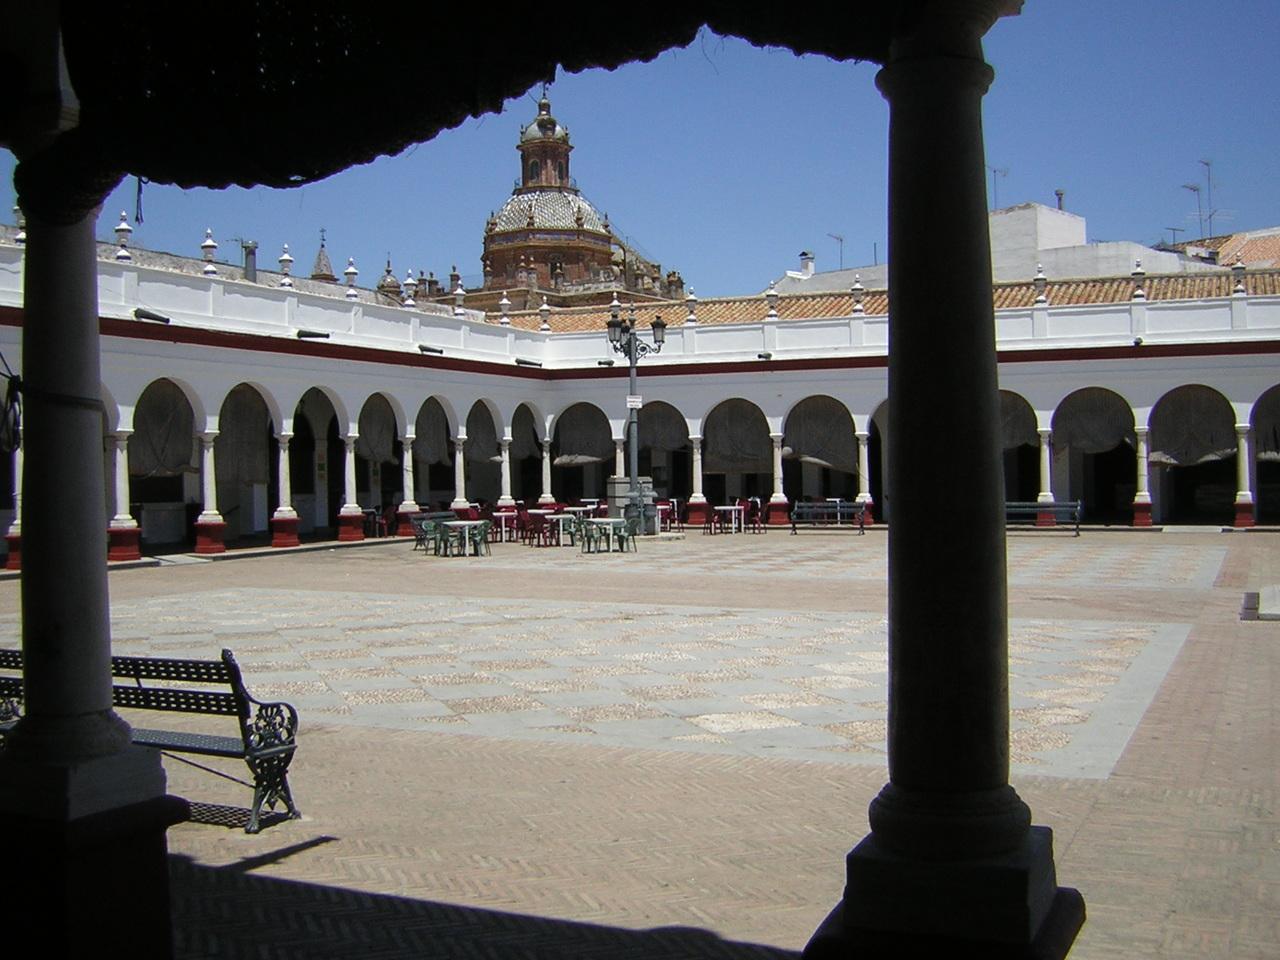 Plaza de Abastos Carmona, Spain